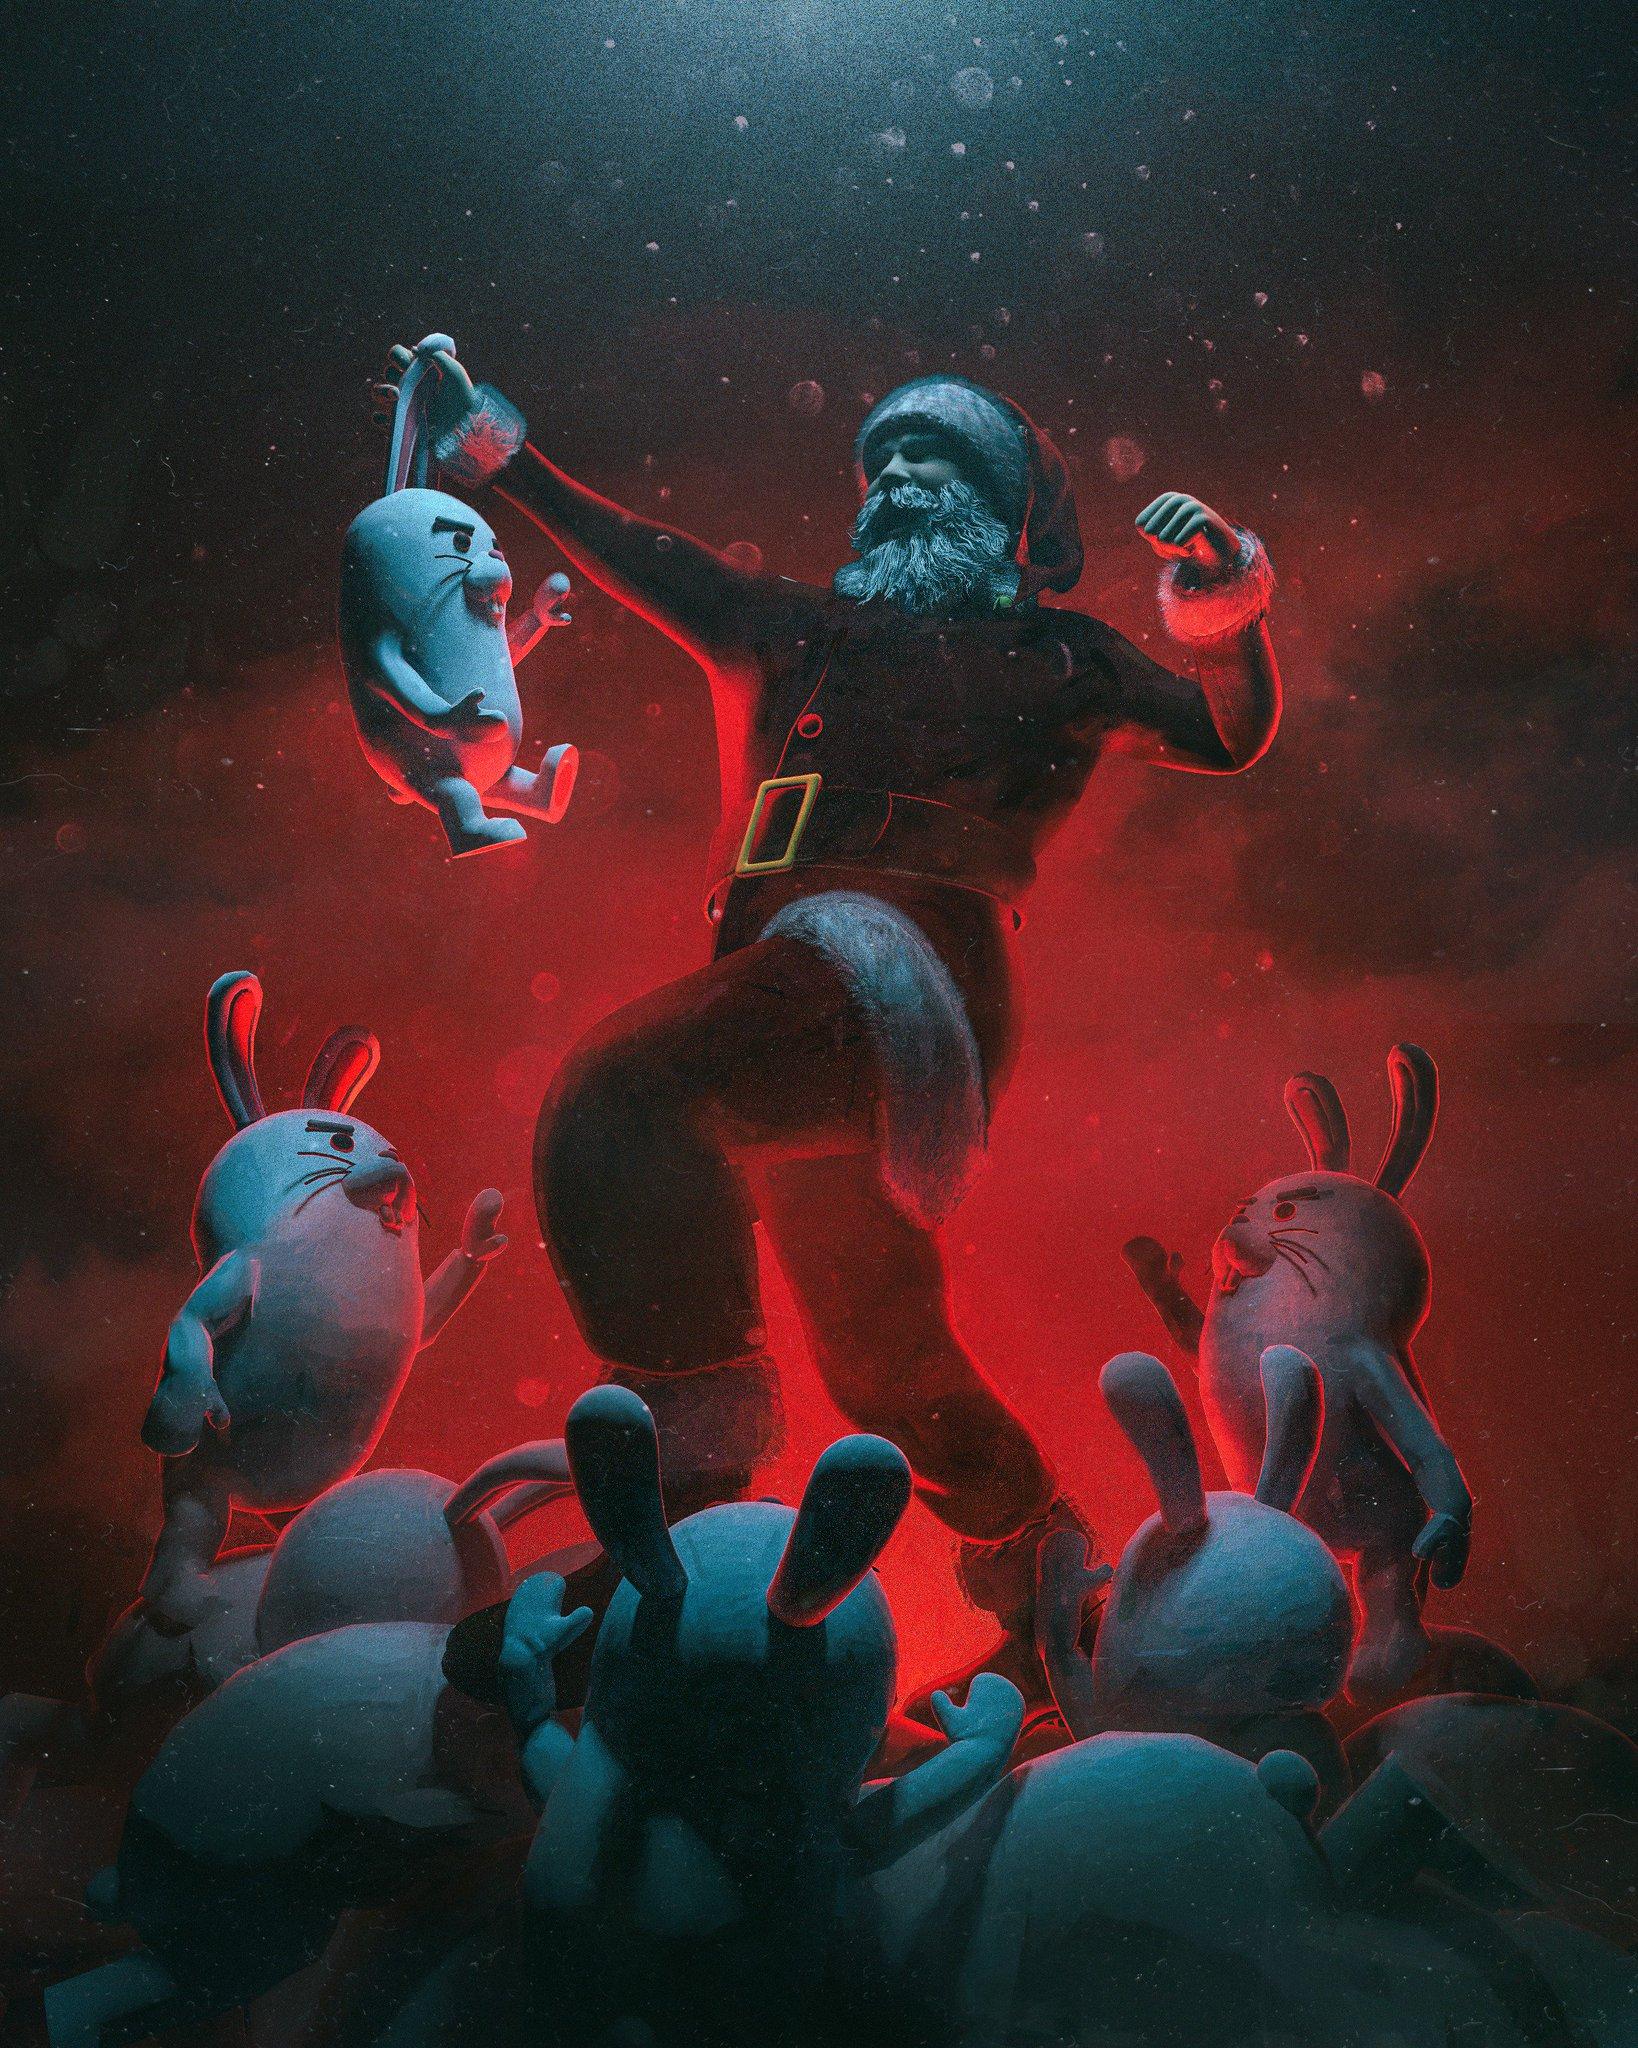 #everyday #cinema4d - EASTER VS. CHRISTMAS https://t.co/nG1cNfxptk